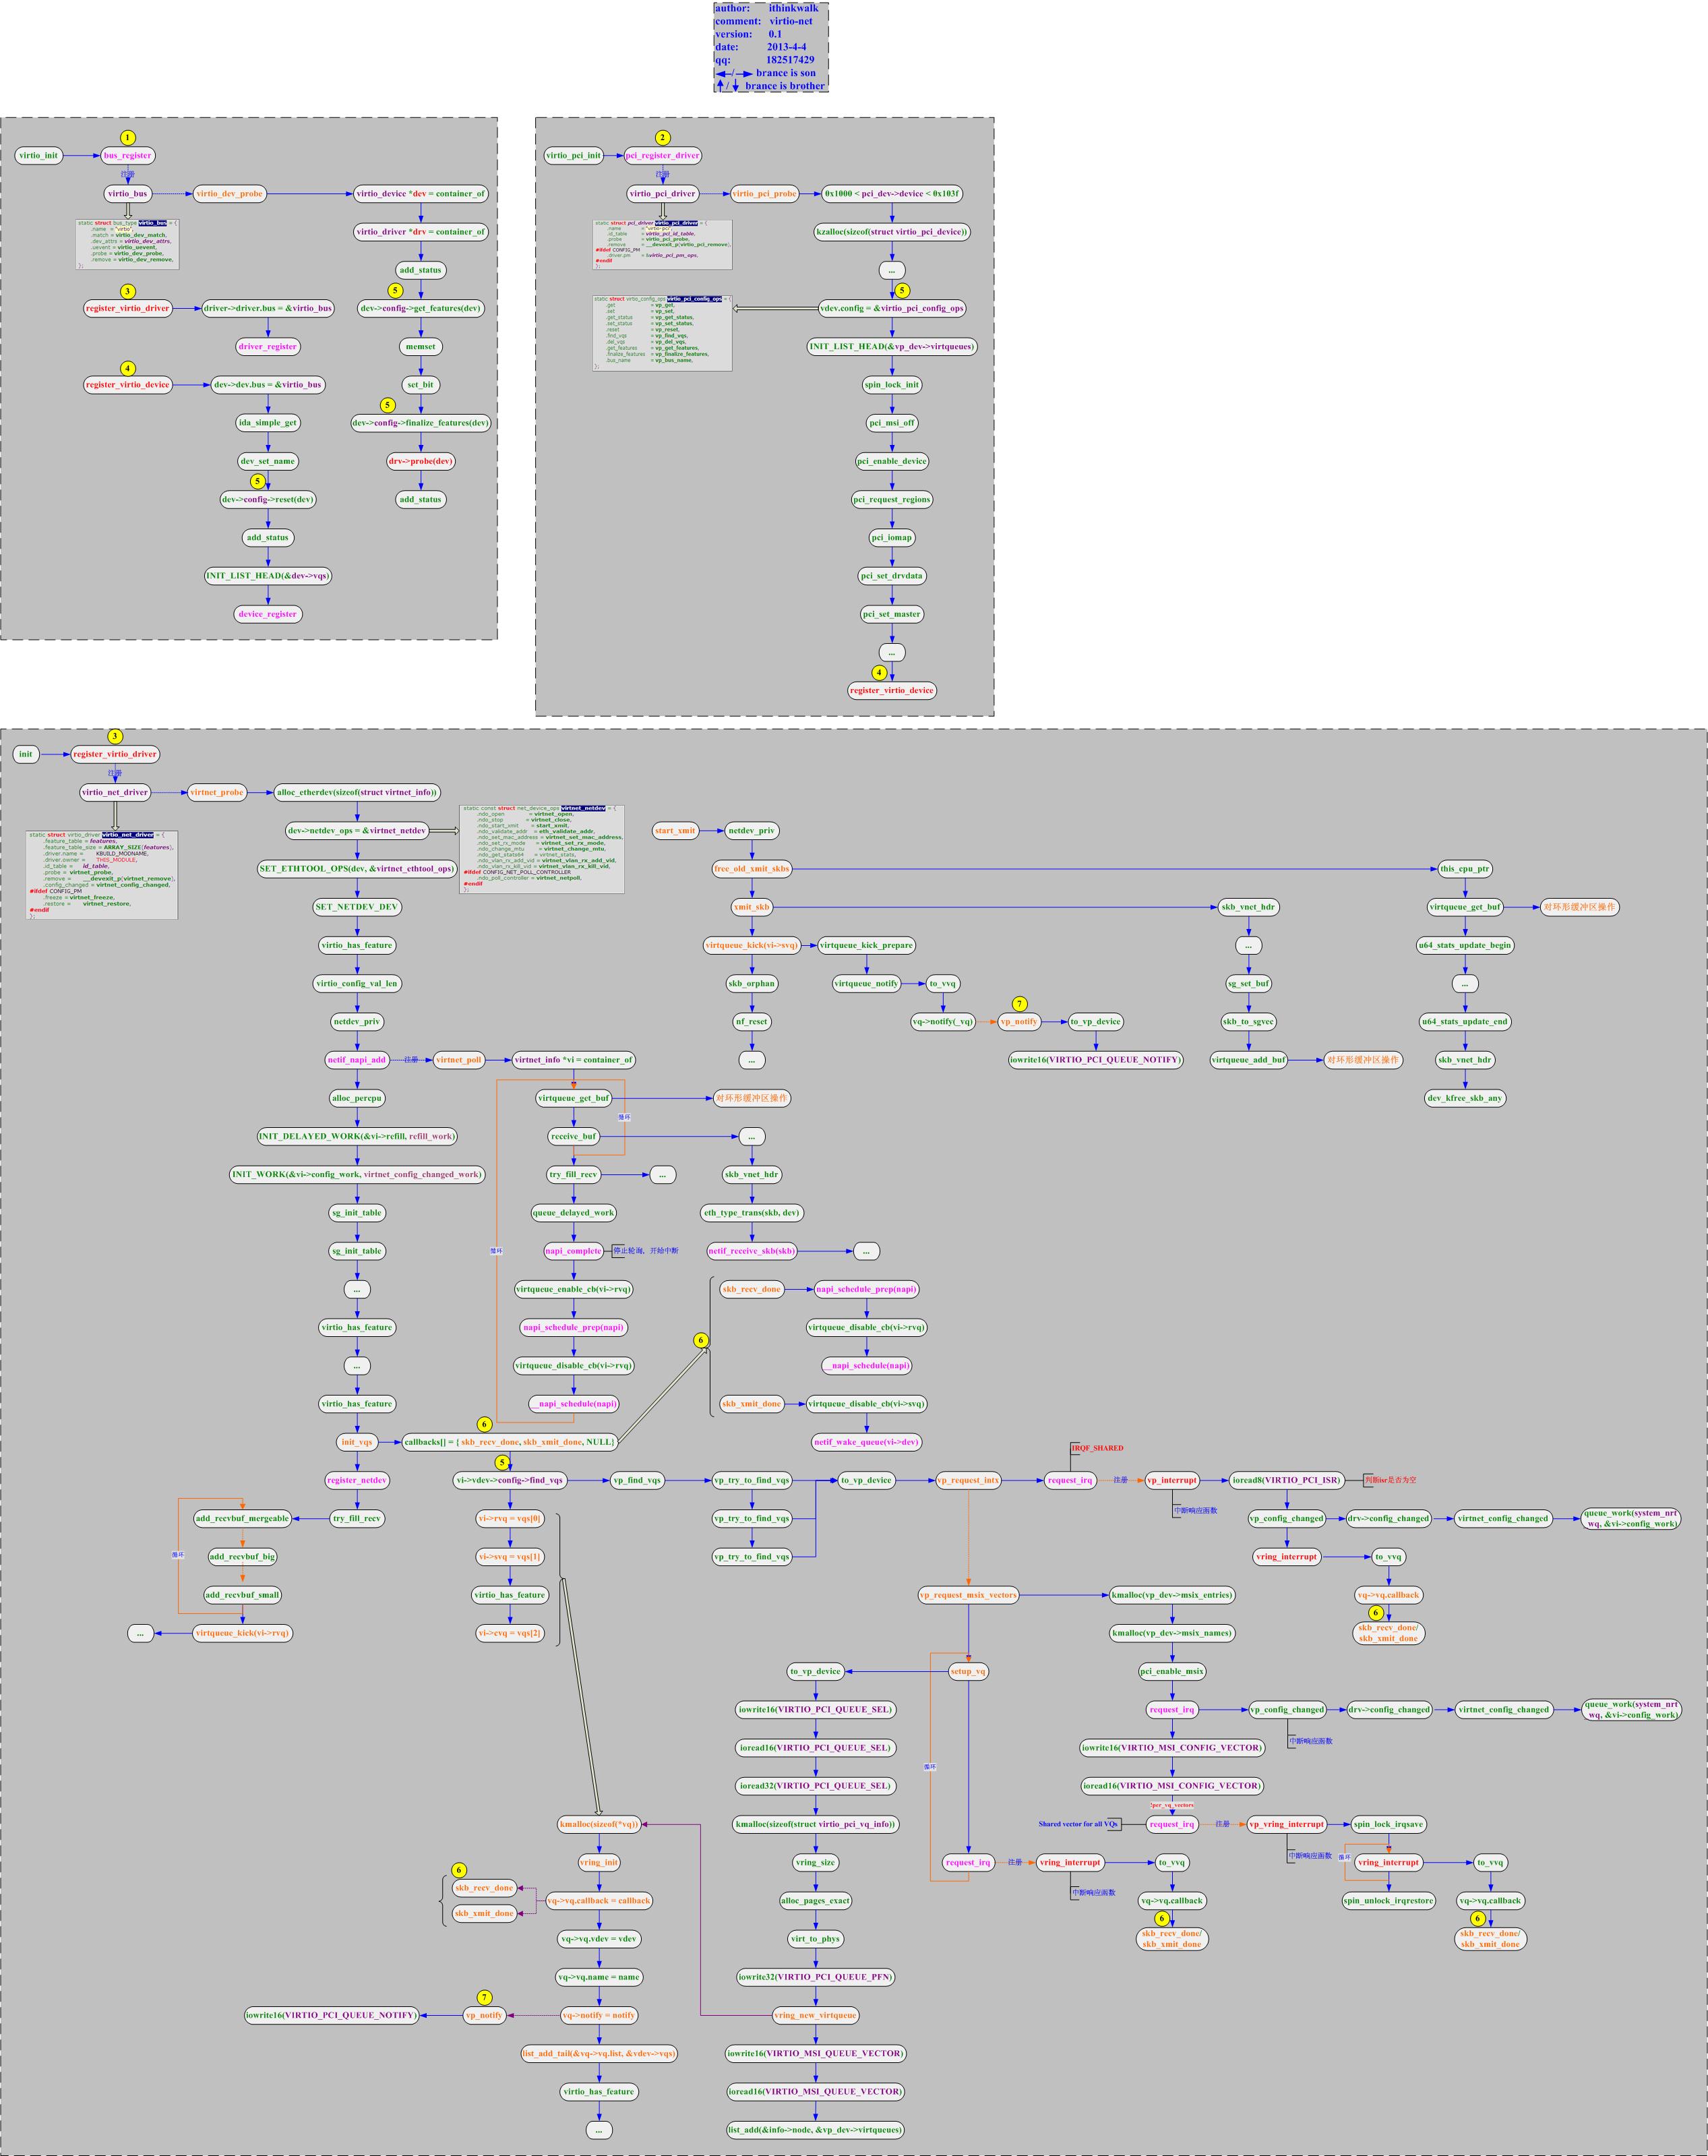 virtio-net前端驱动实现流程图v0.1